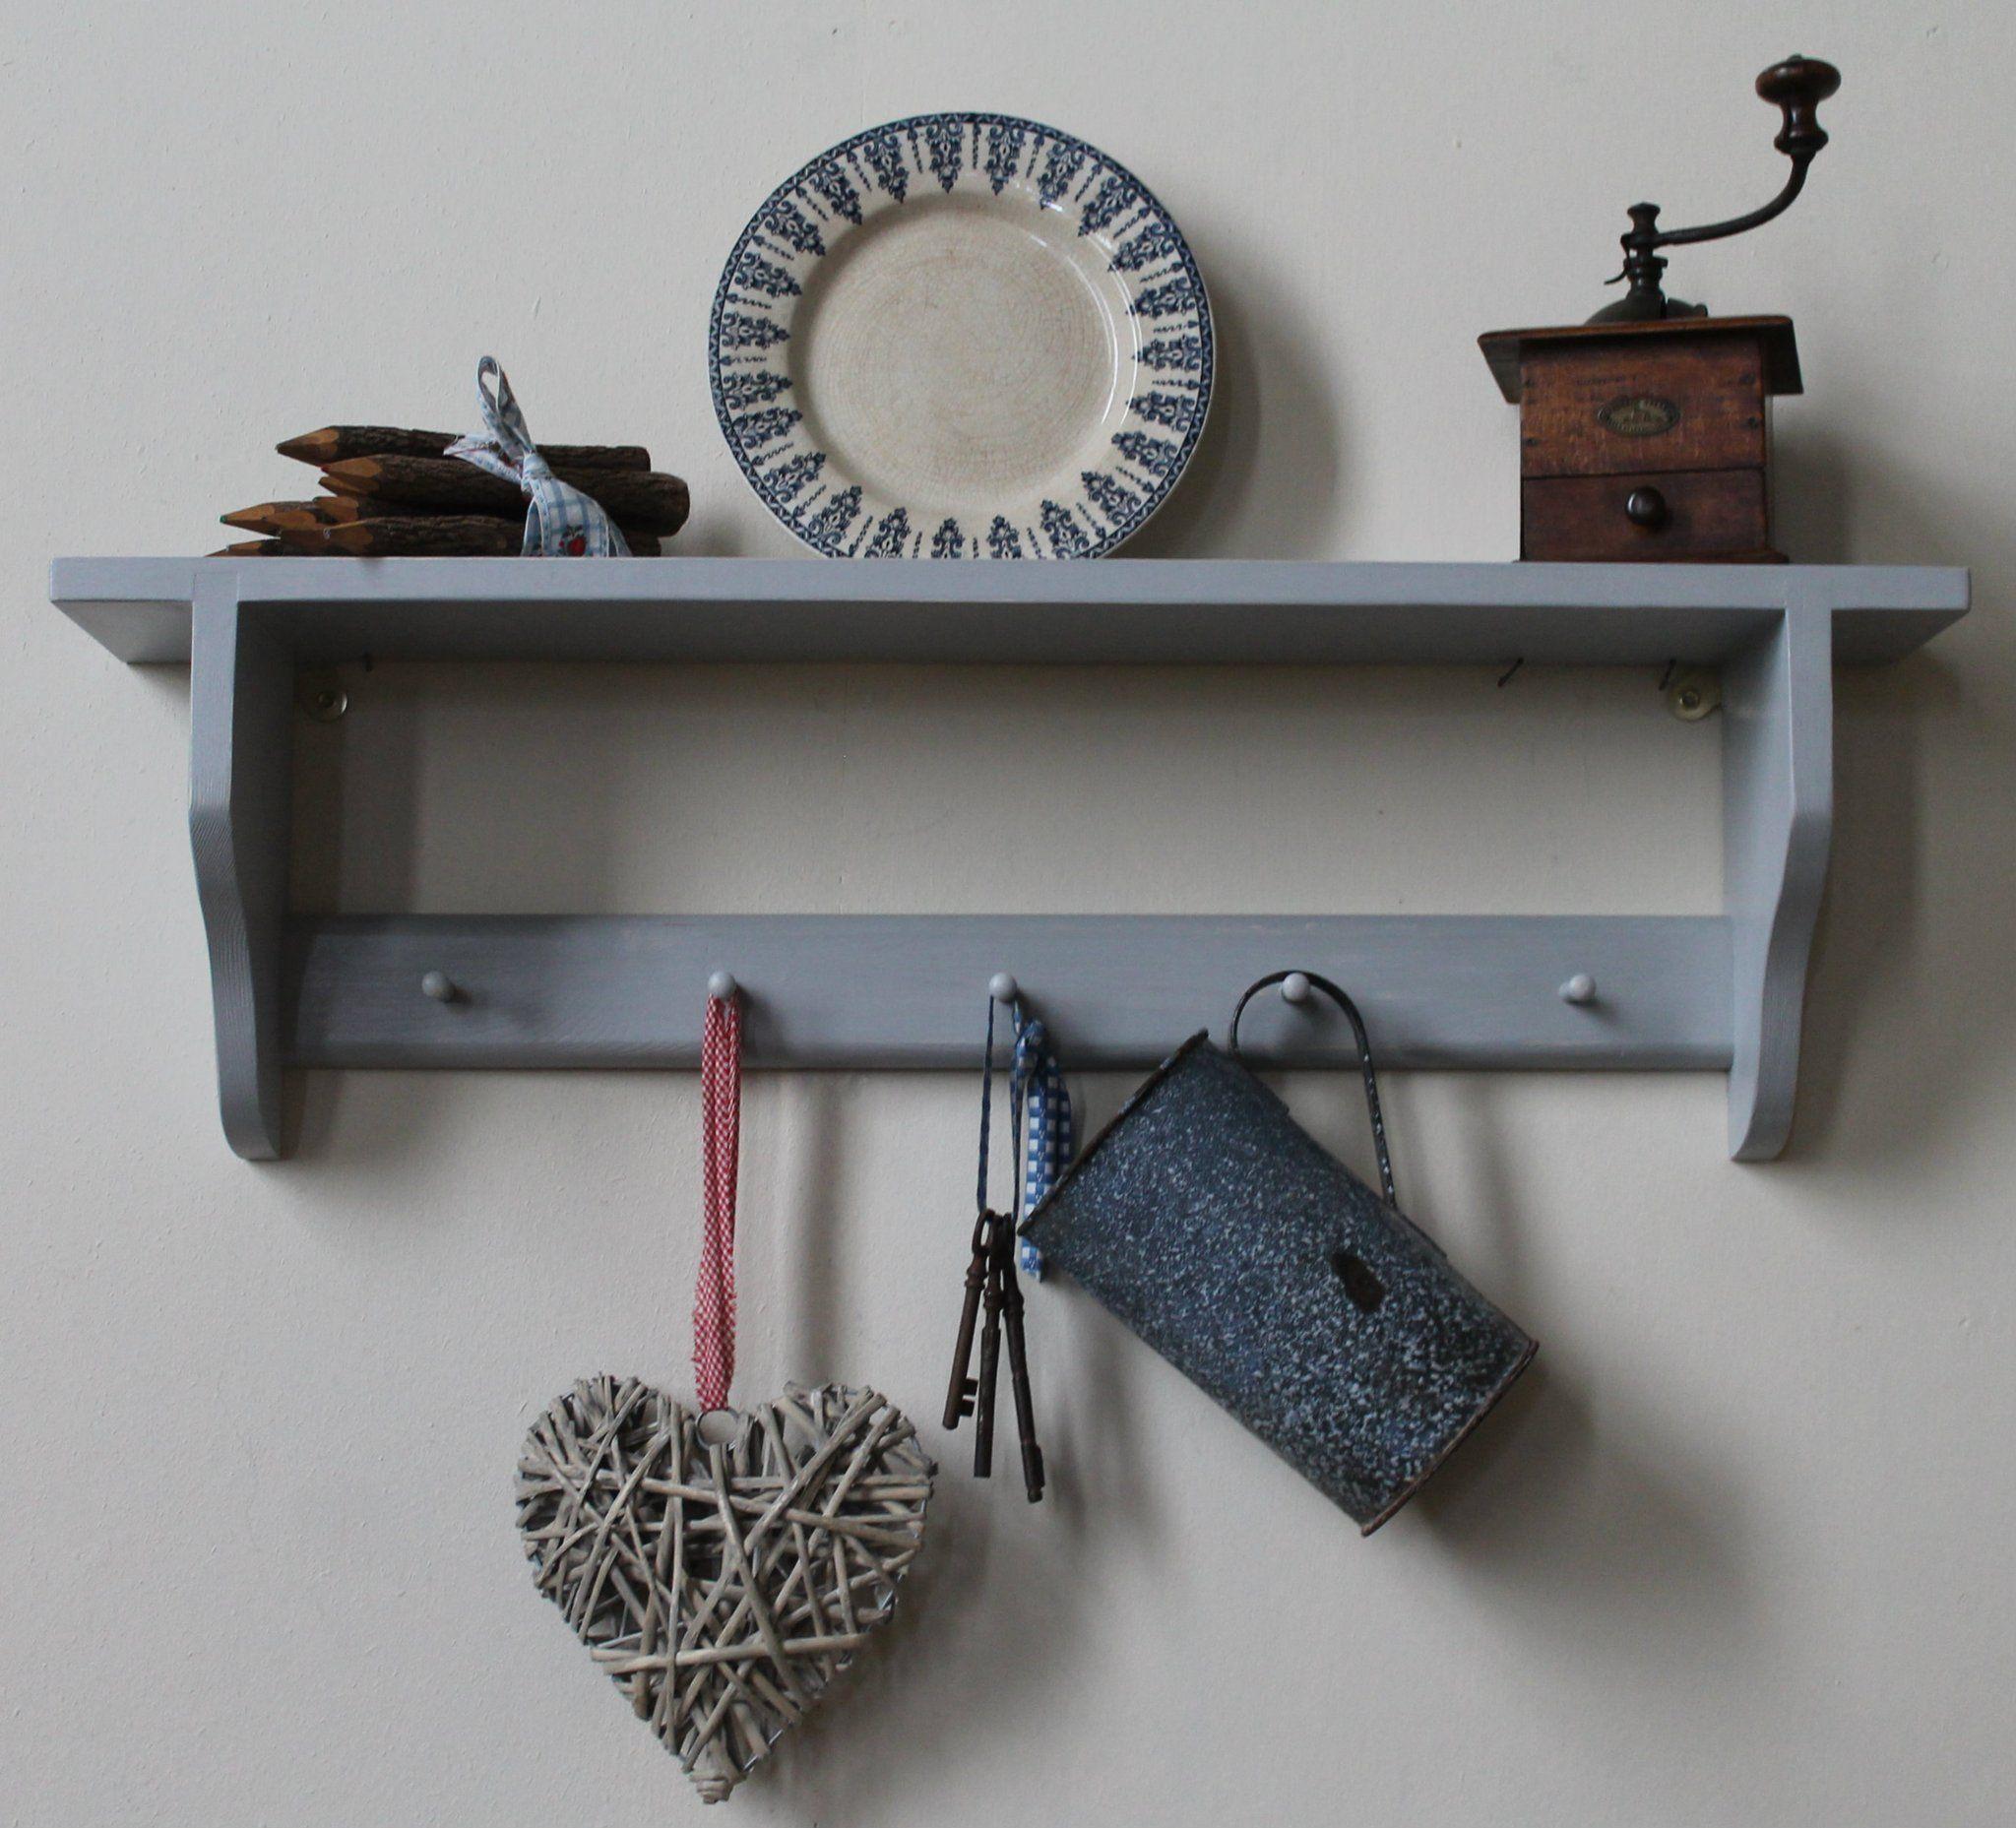 SHAKER 1 shelf with small pegs Shelves, Shabby chic, Shabby